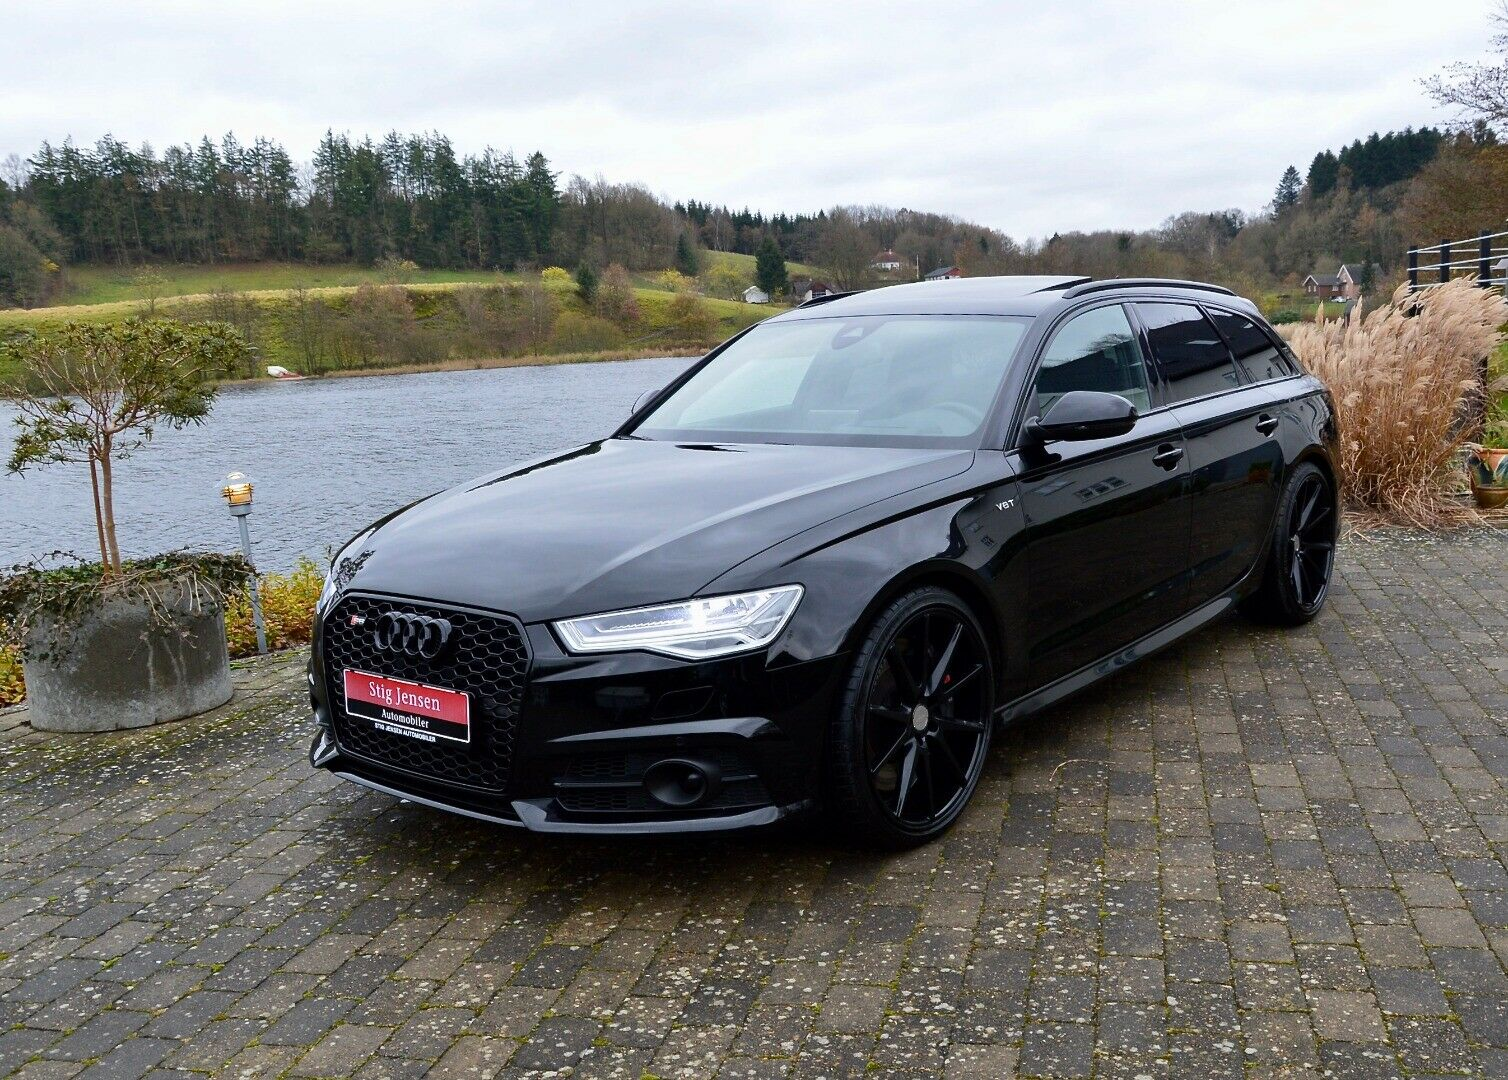 Audi S6 4,0 TFSi Avant quattro S-tr. 5d - 699.900 kr.